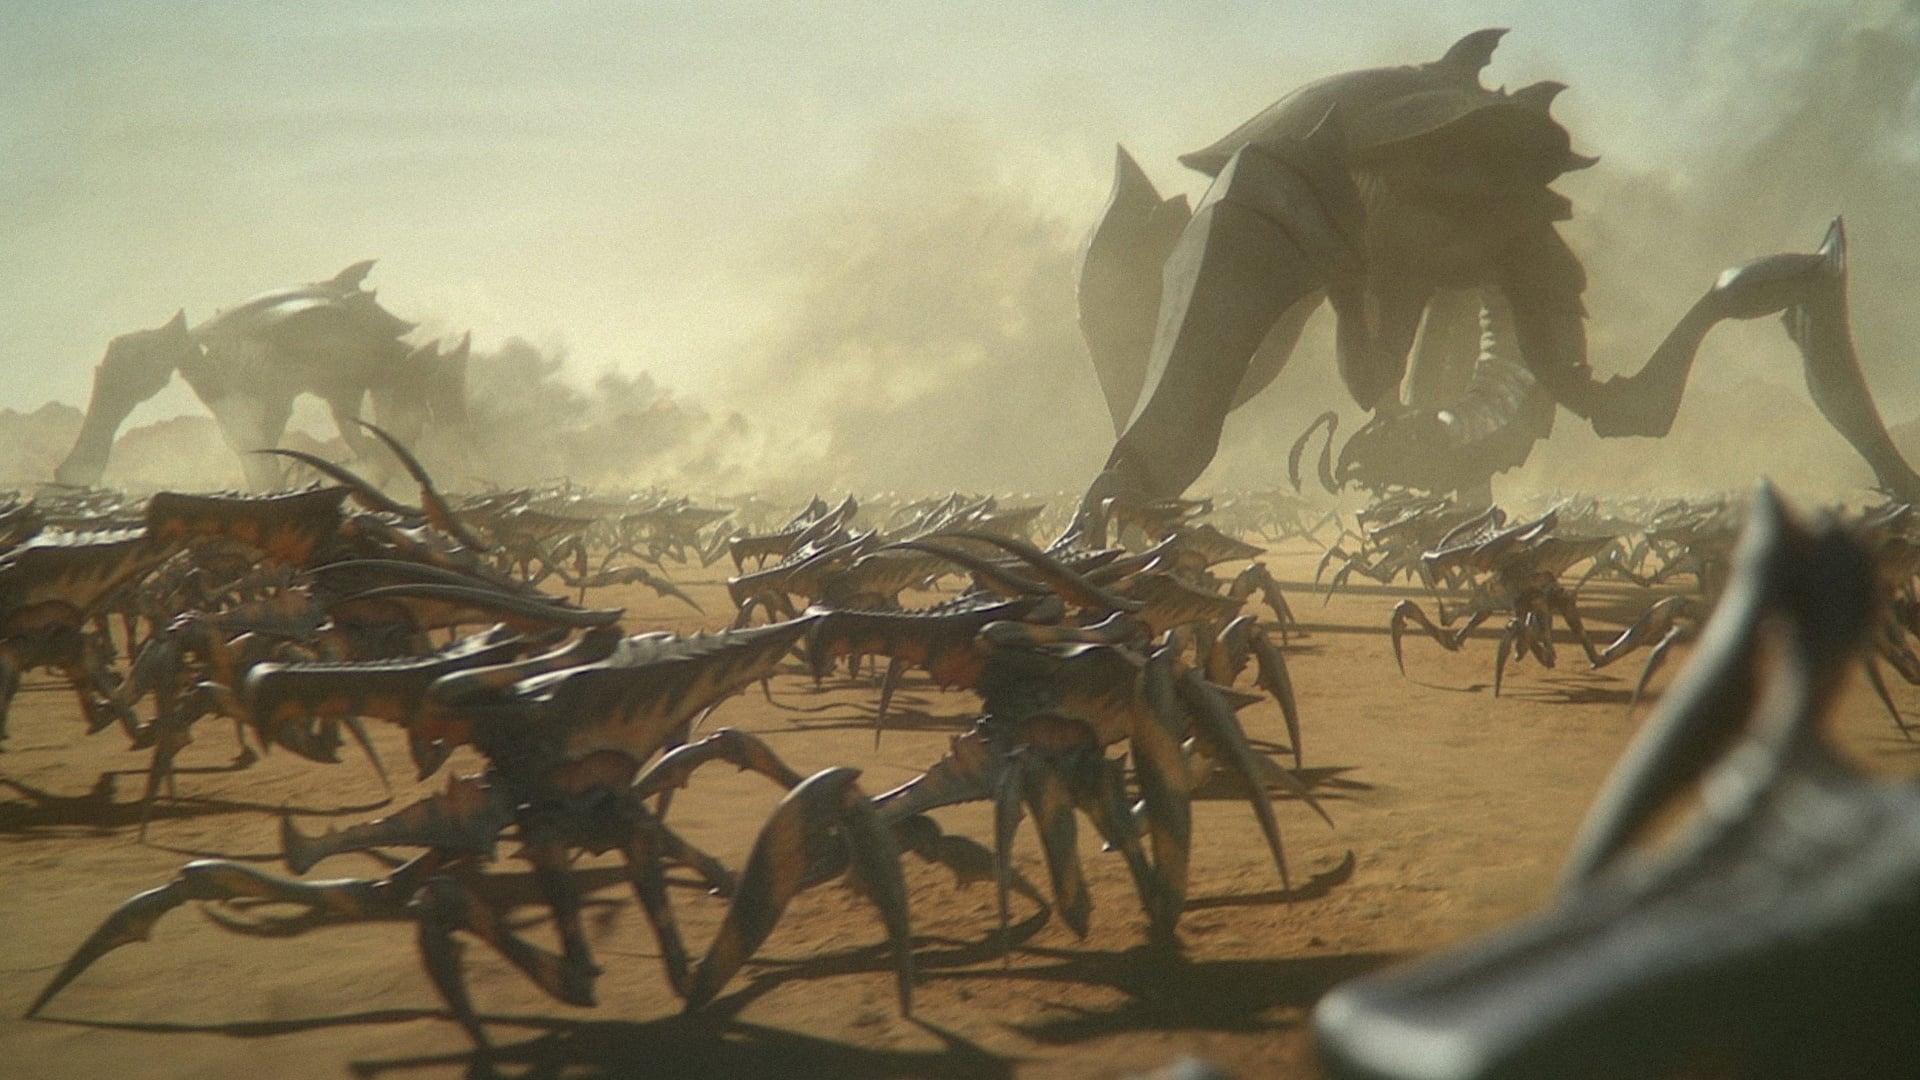 Starship Troopers 5: Traidor de Marte